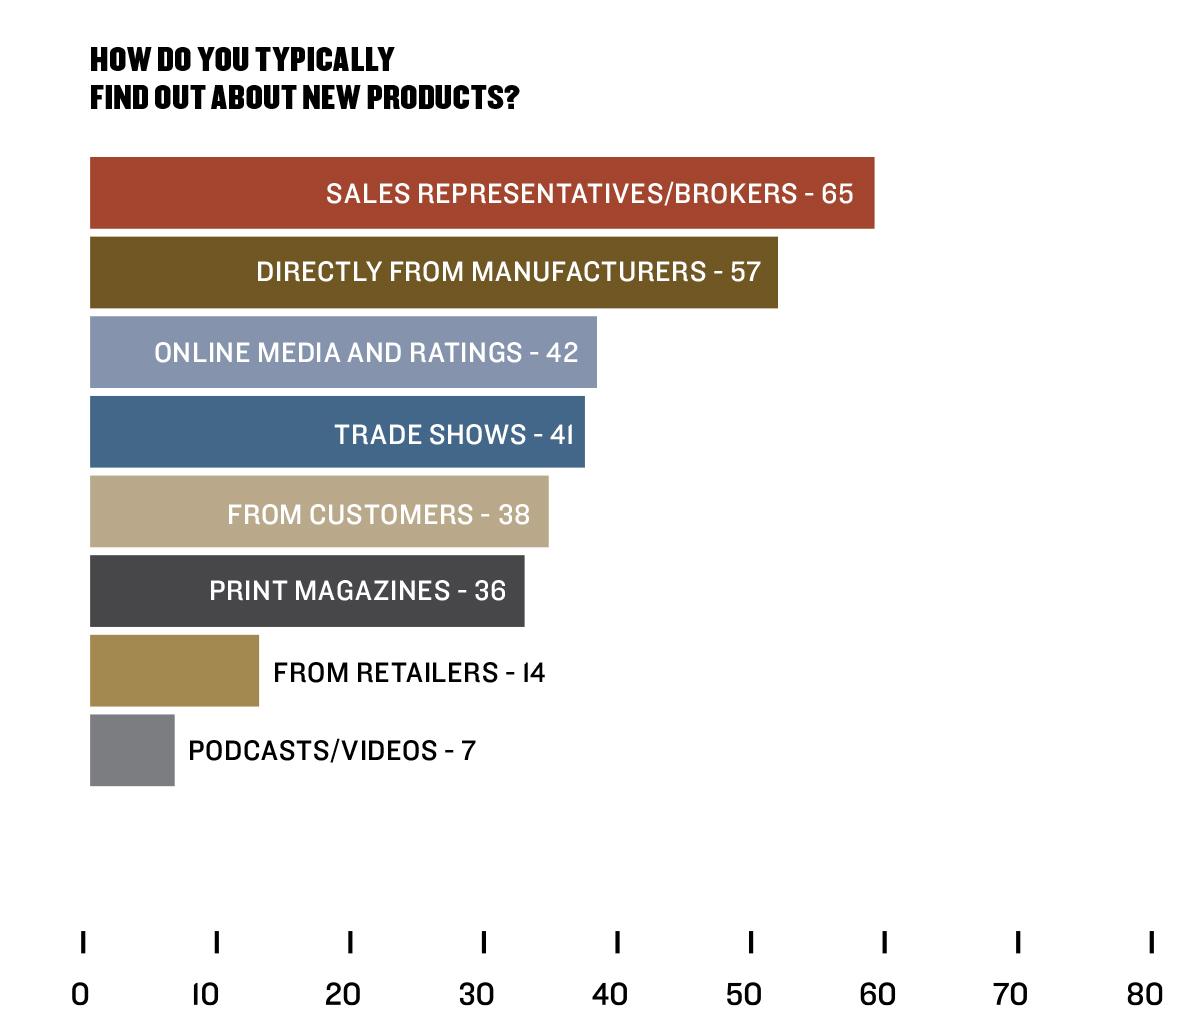 Retail Survey 2020 | New Product Awareness